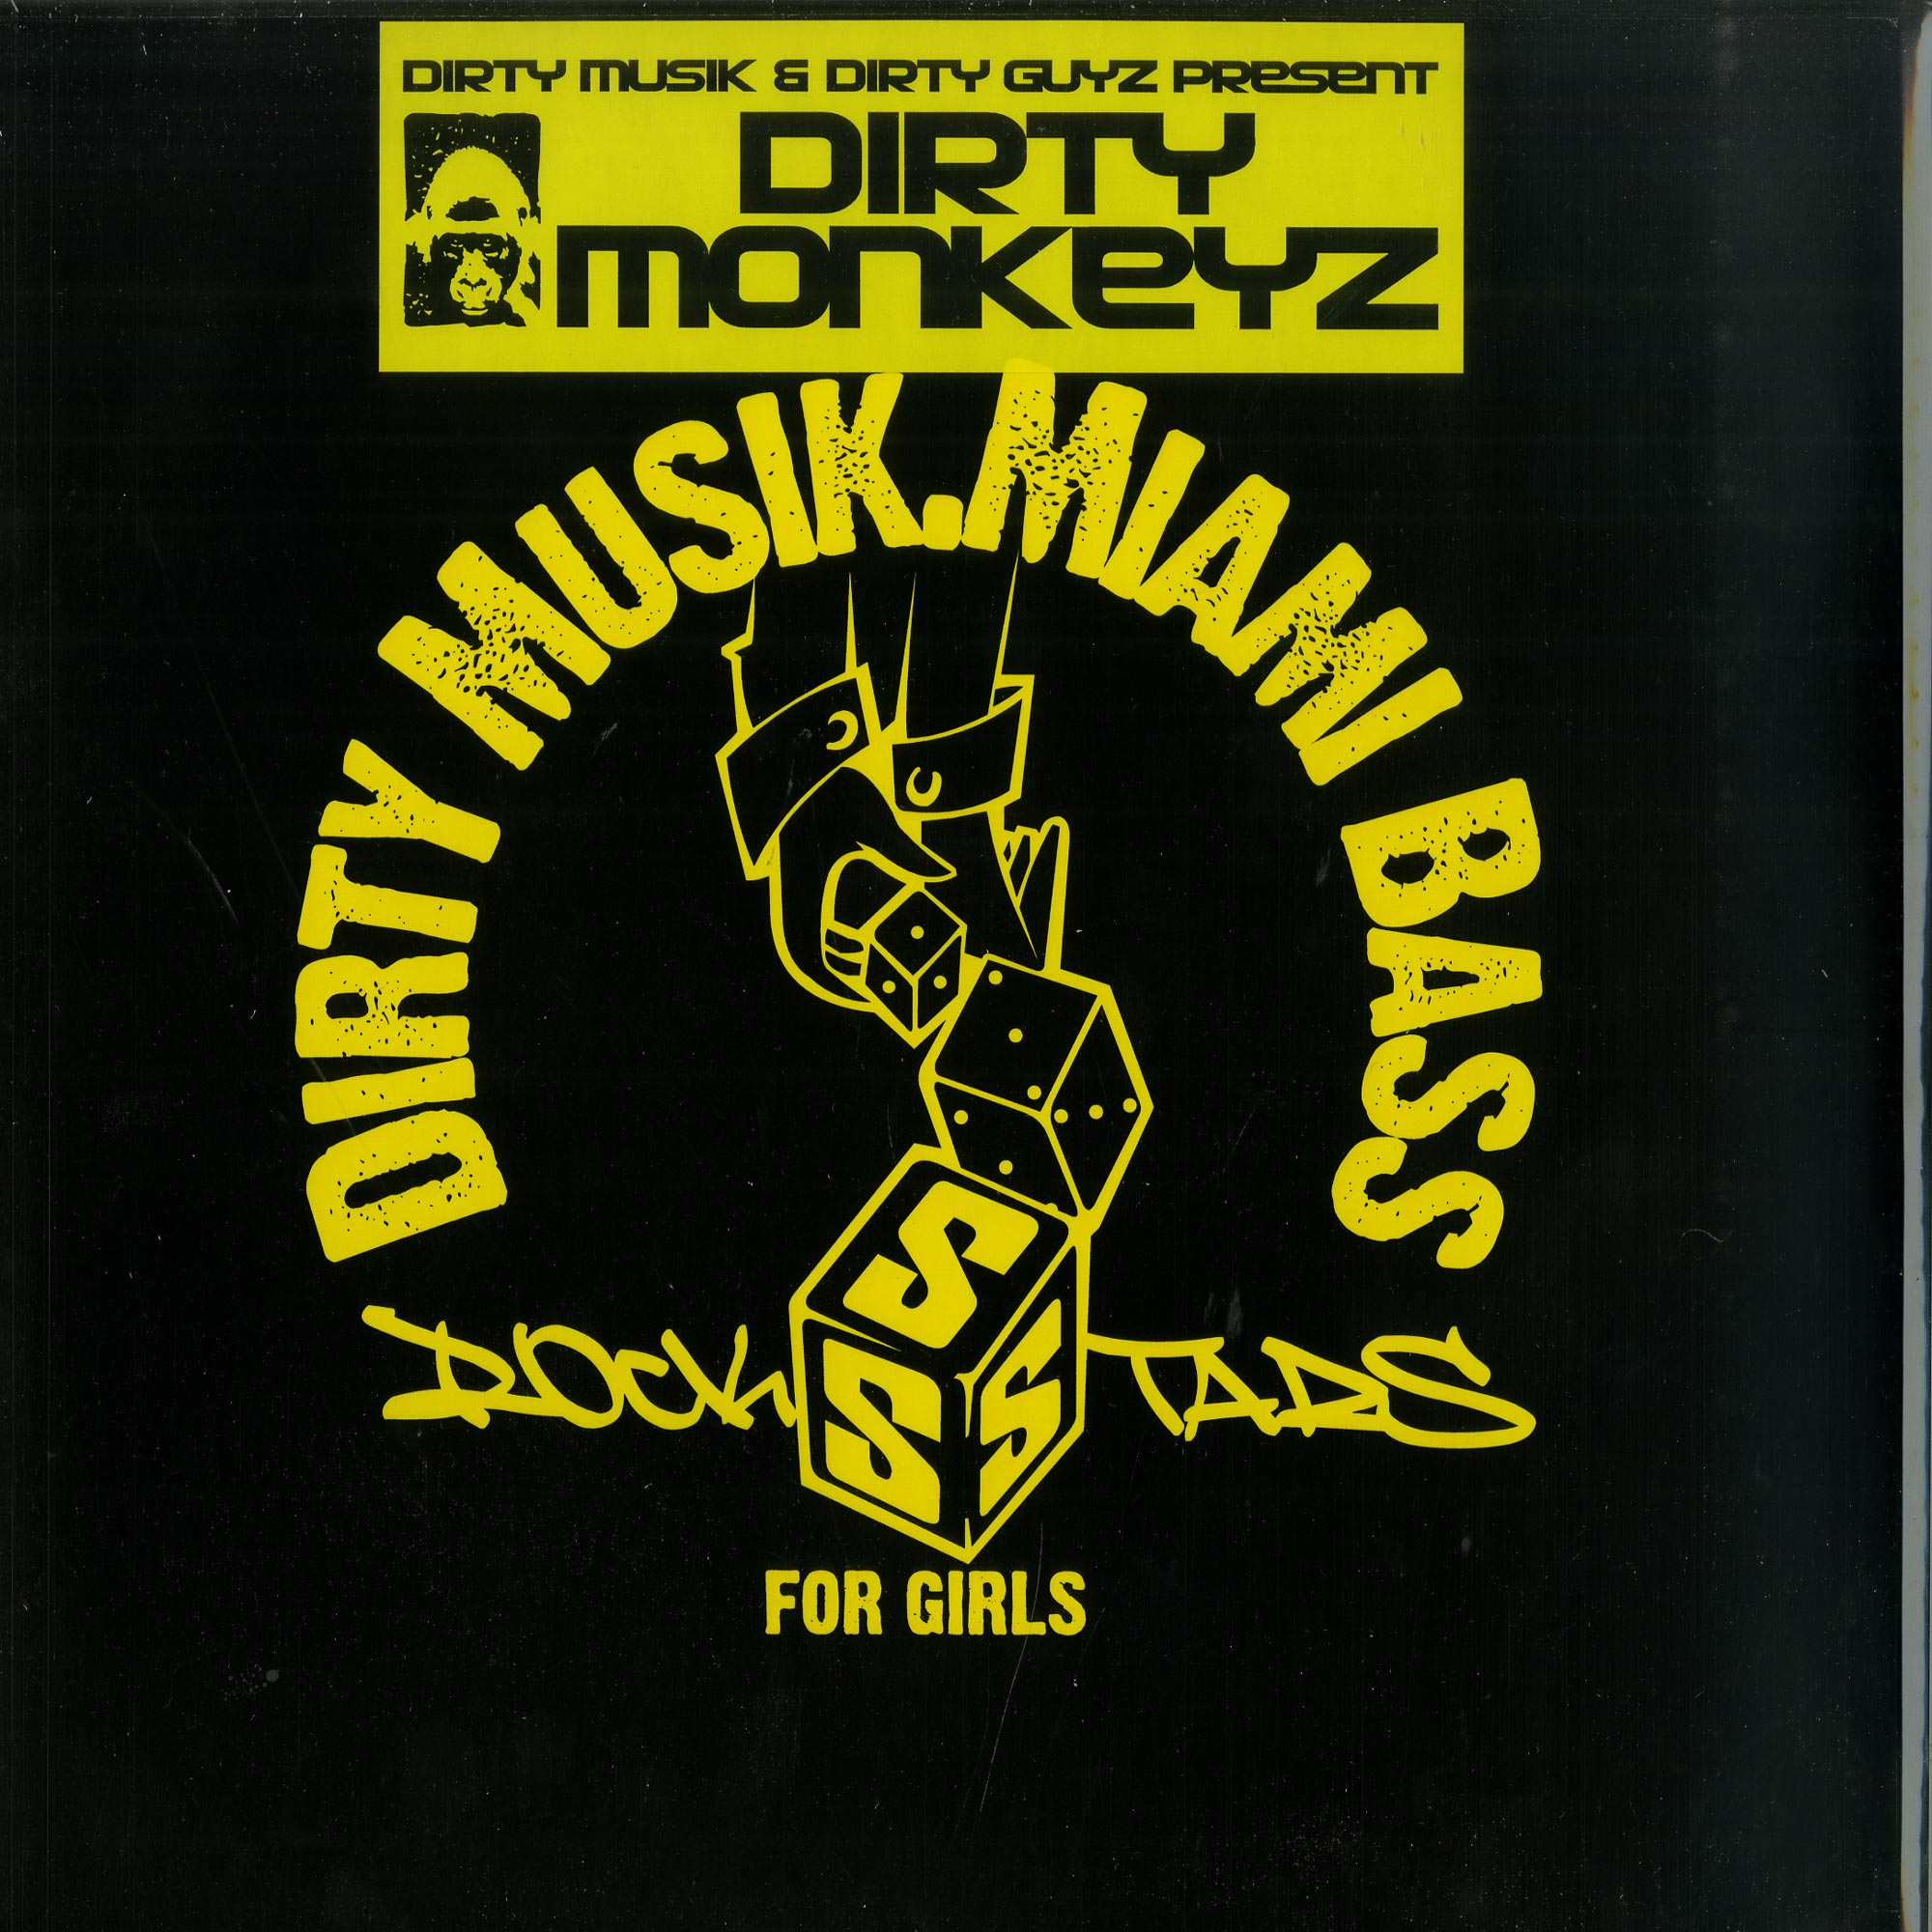 Dirty Monkeyz / The Knicker Bockerz - DIRTY MUSIK & DIRTY GUYZ PRESENT DIRTY MONKEYZ